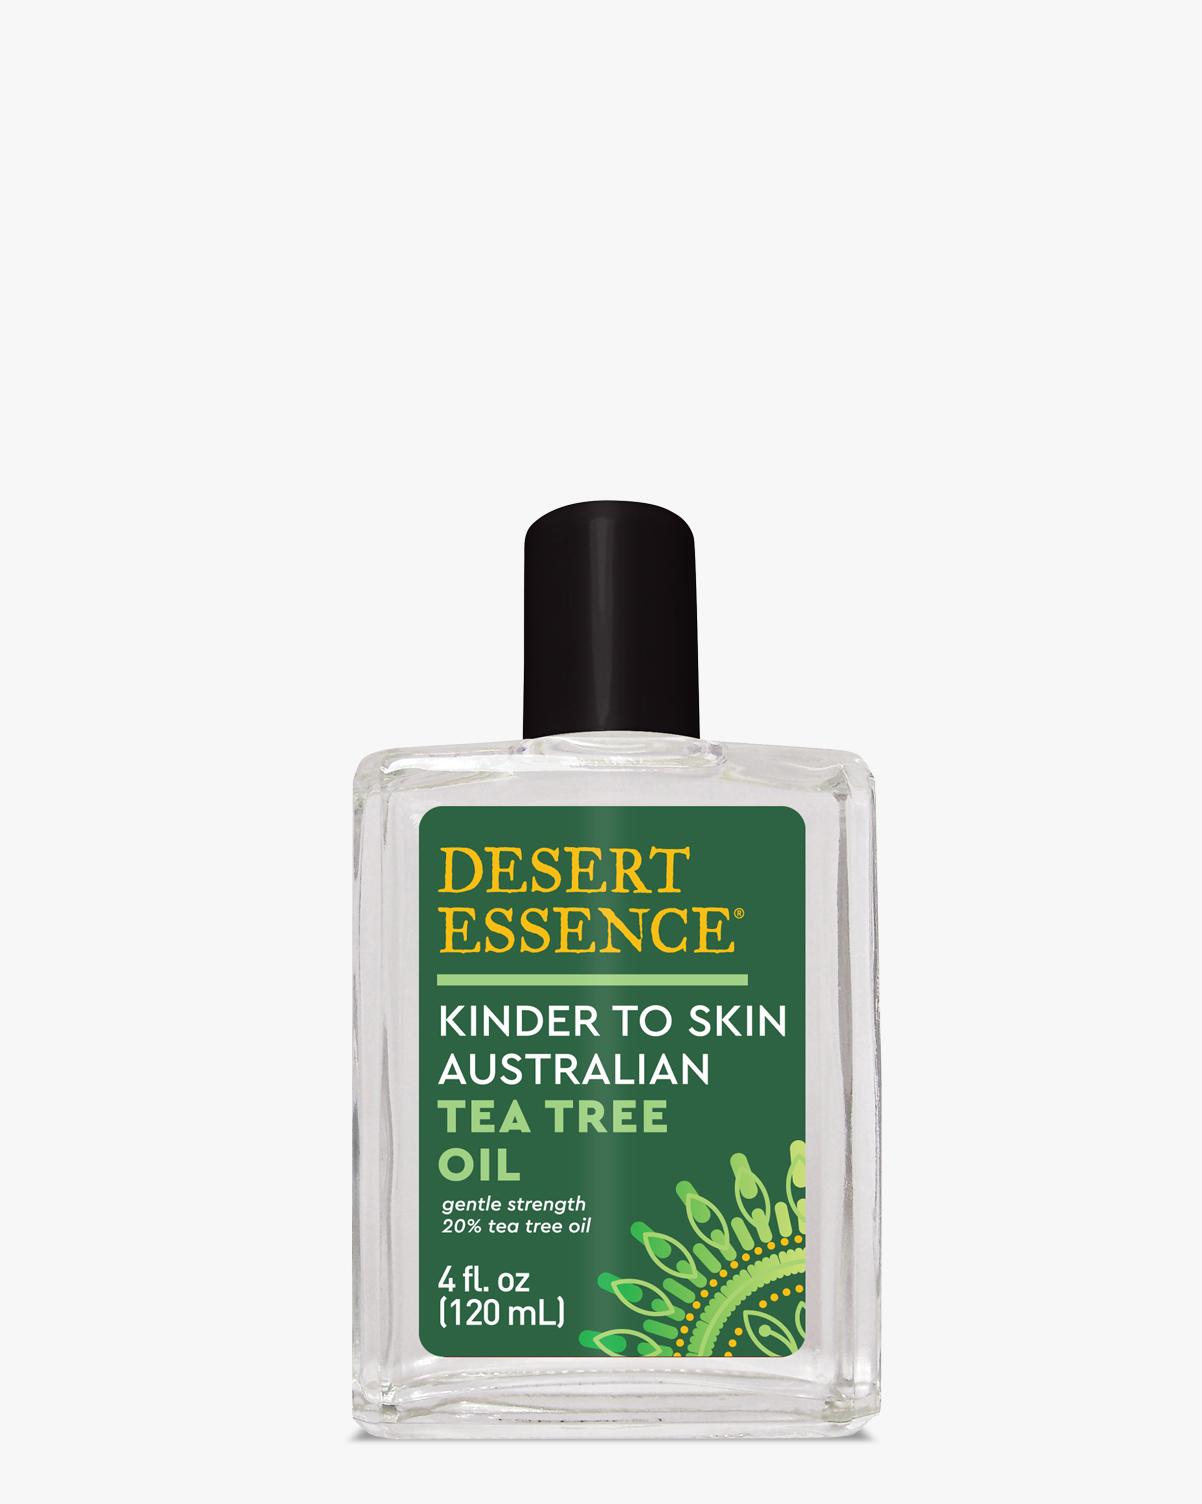 Desert Essence coupon: Desert Essence Kinder To Skin Australian Tea Tree Oil, 4 fl. oz. | Vegan | Gluten-Free